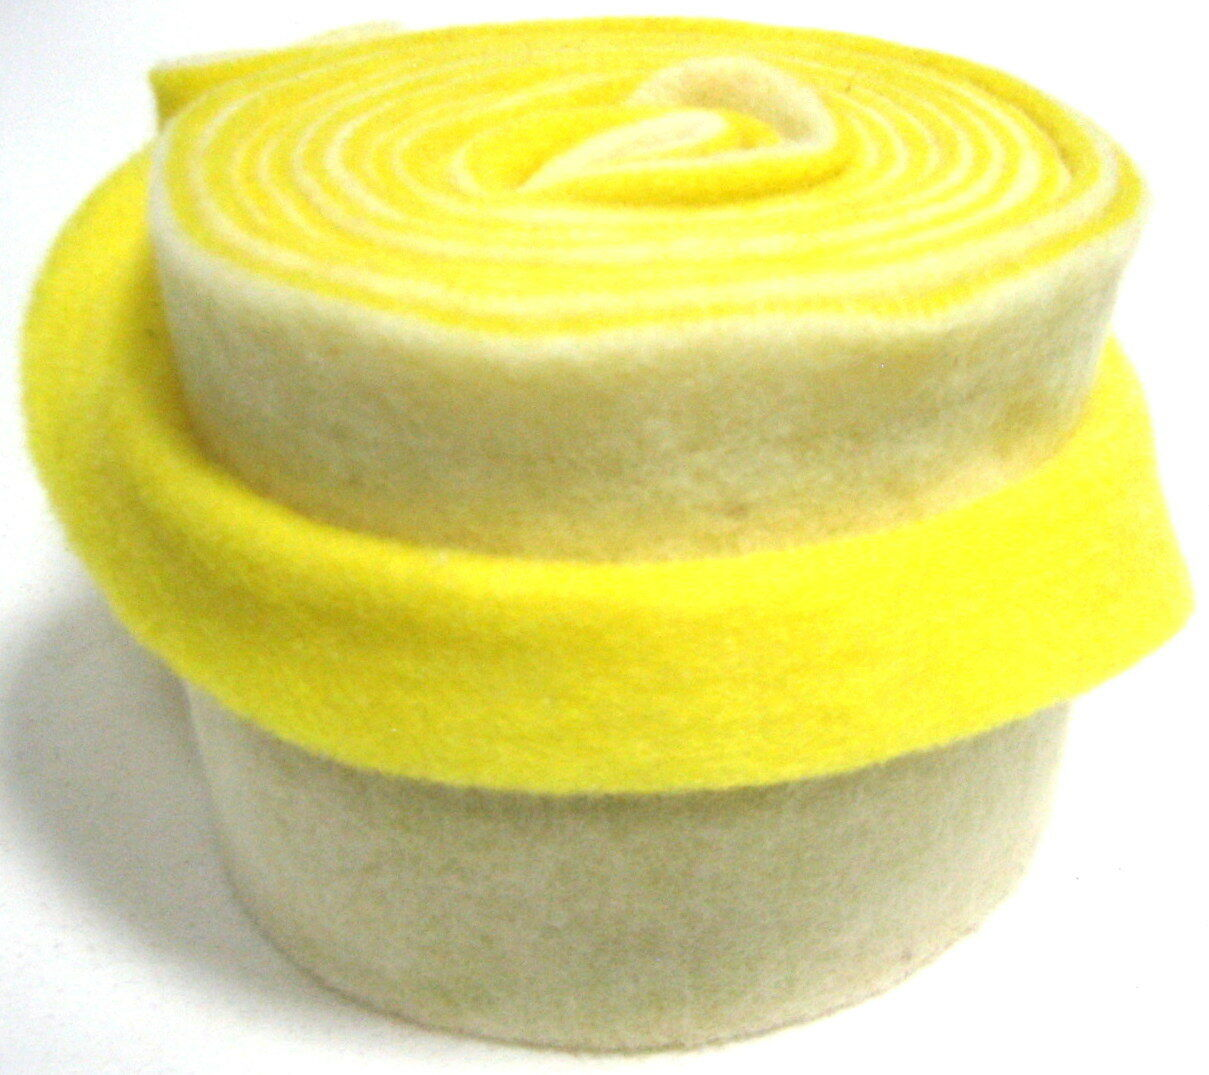 Topfband Filz 5 m x 15 cm zwei-farbige Dekoband Wollvlies Filz-Band Wollband  - weiß-gelb